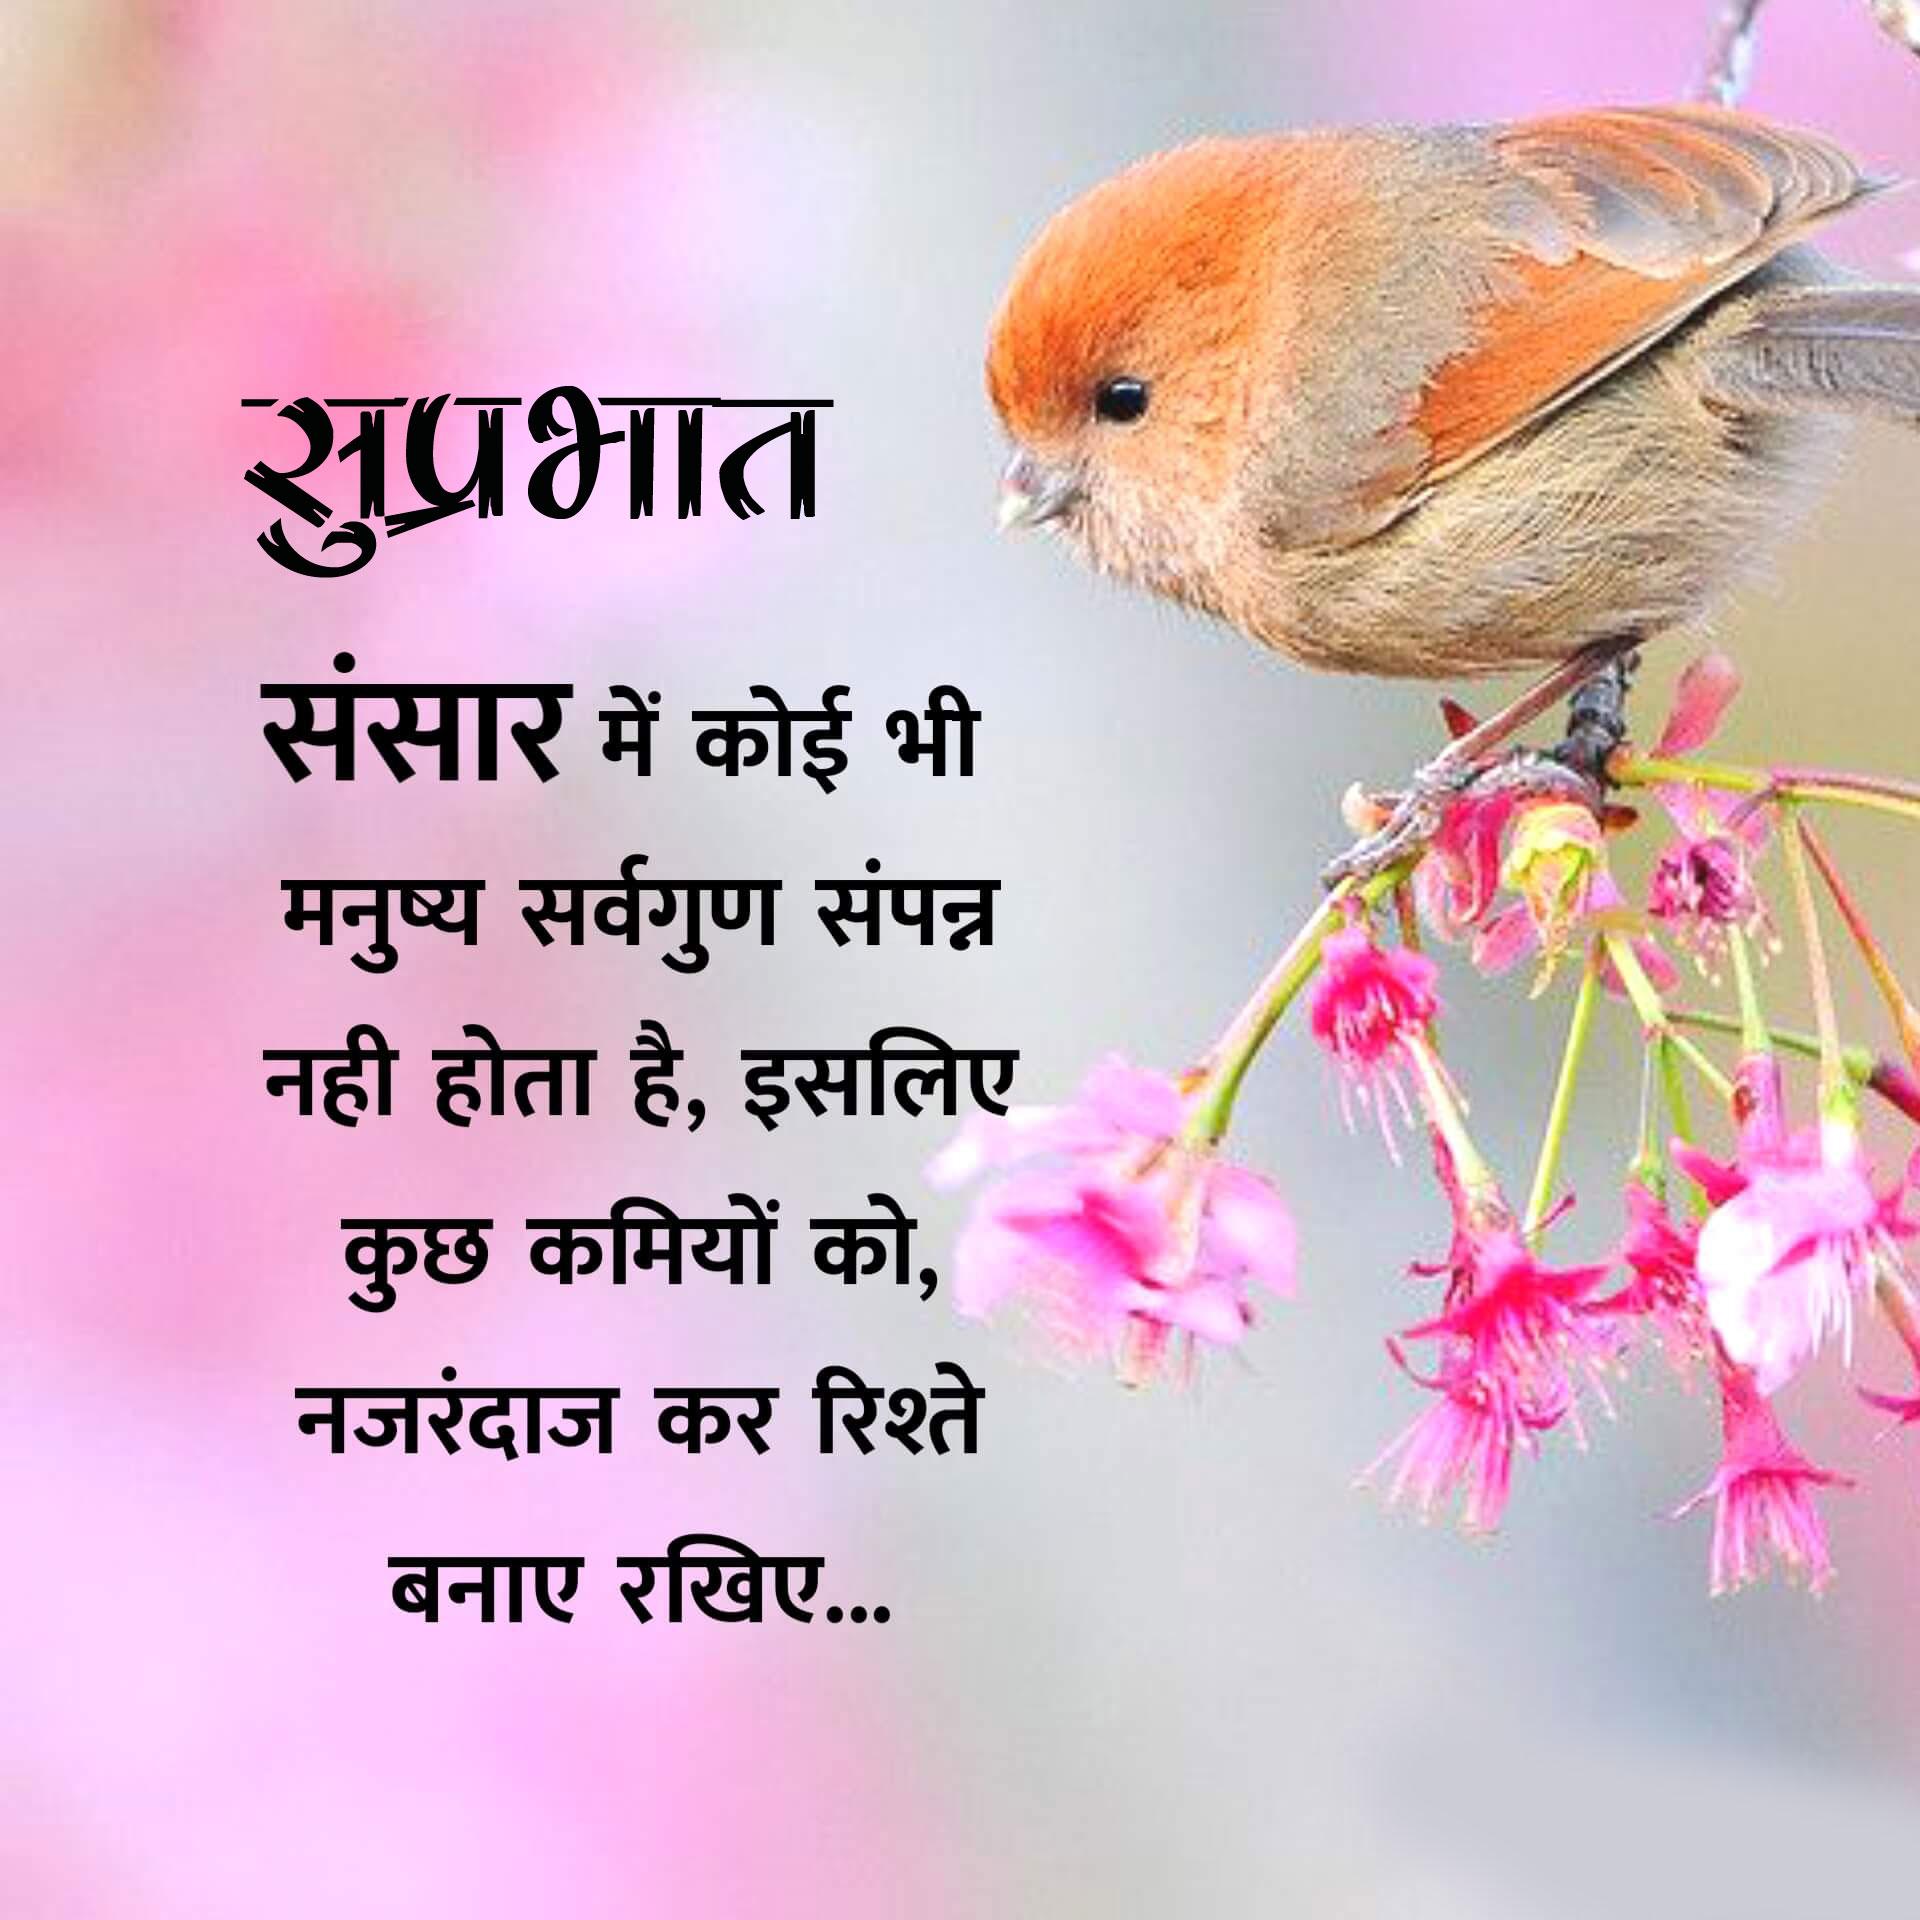 New Beautiful Suprabhat Images pics photo download